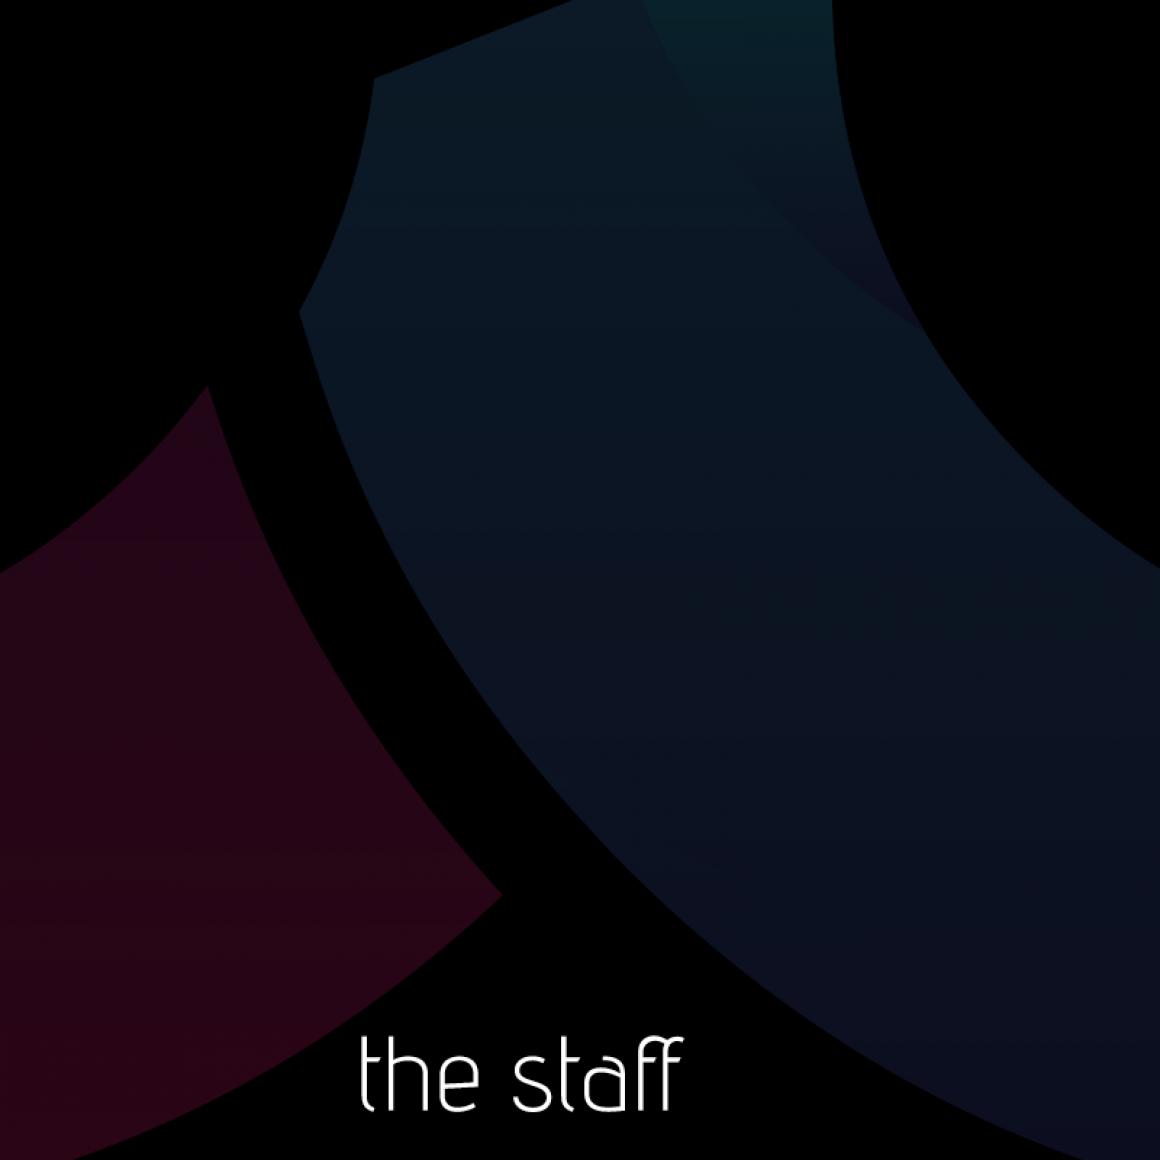 theStaff_05